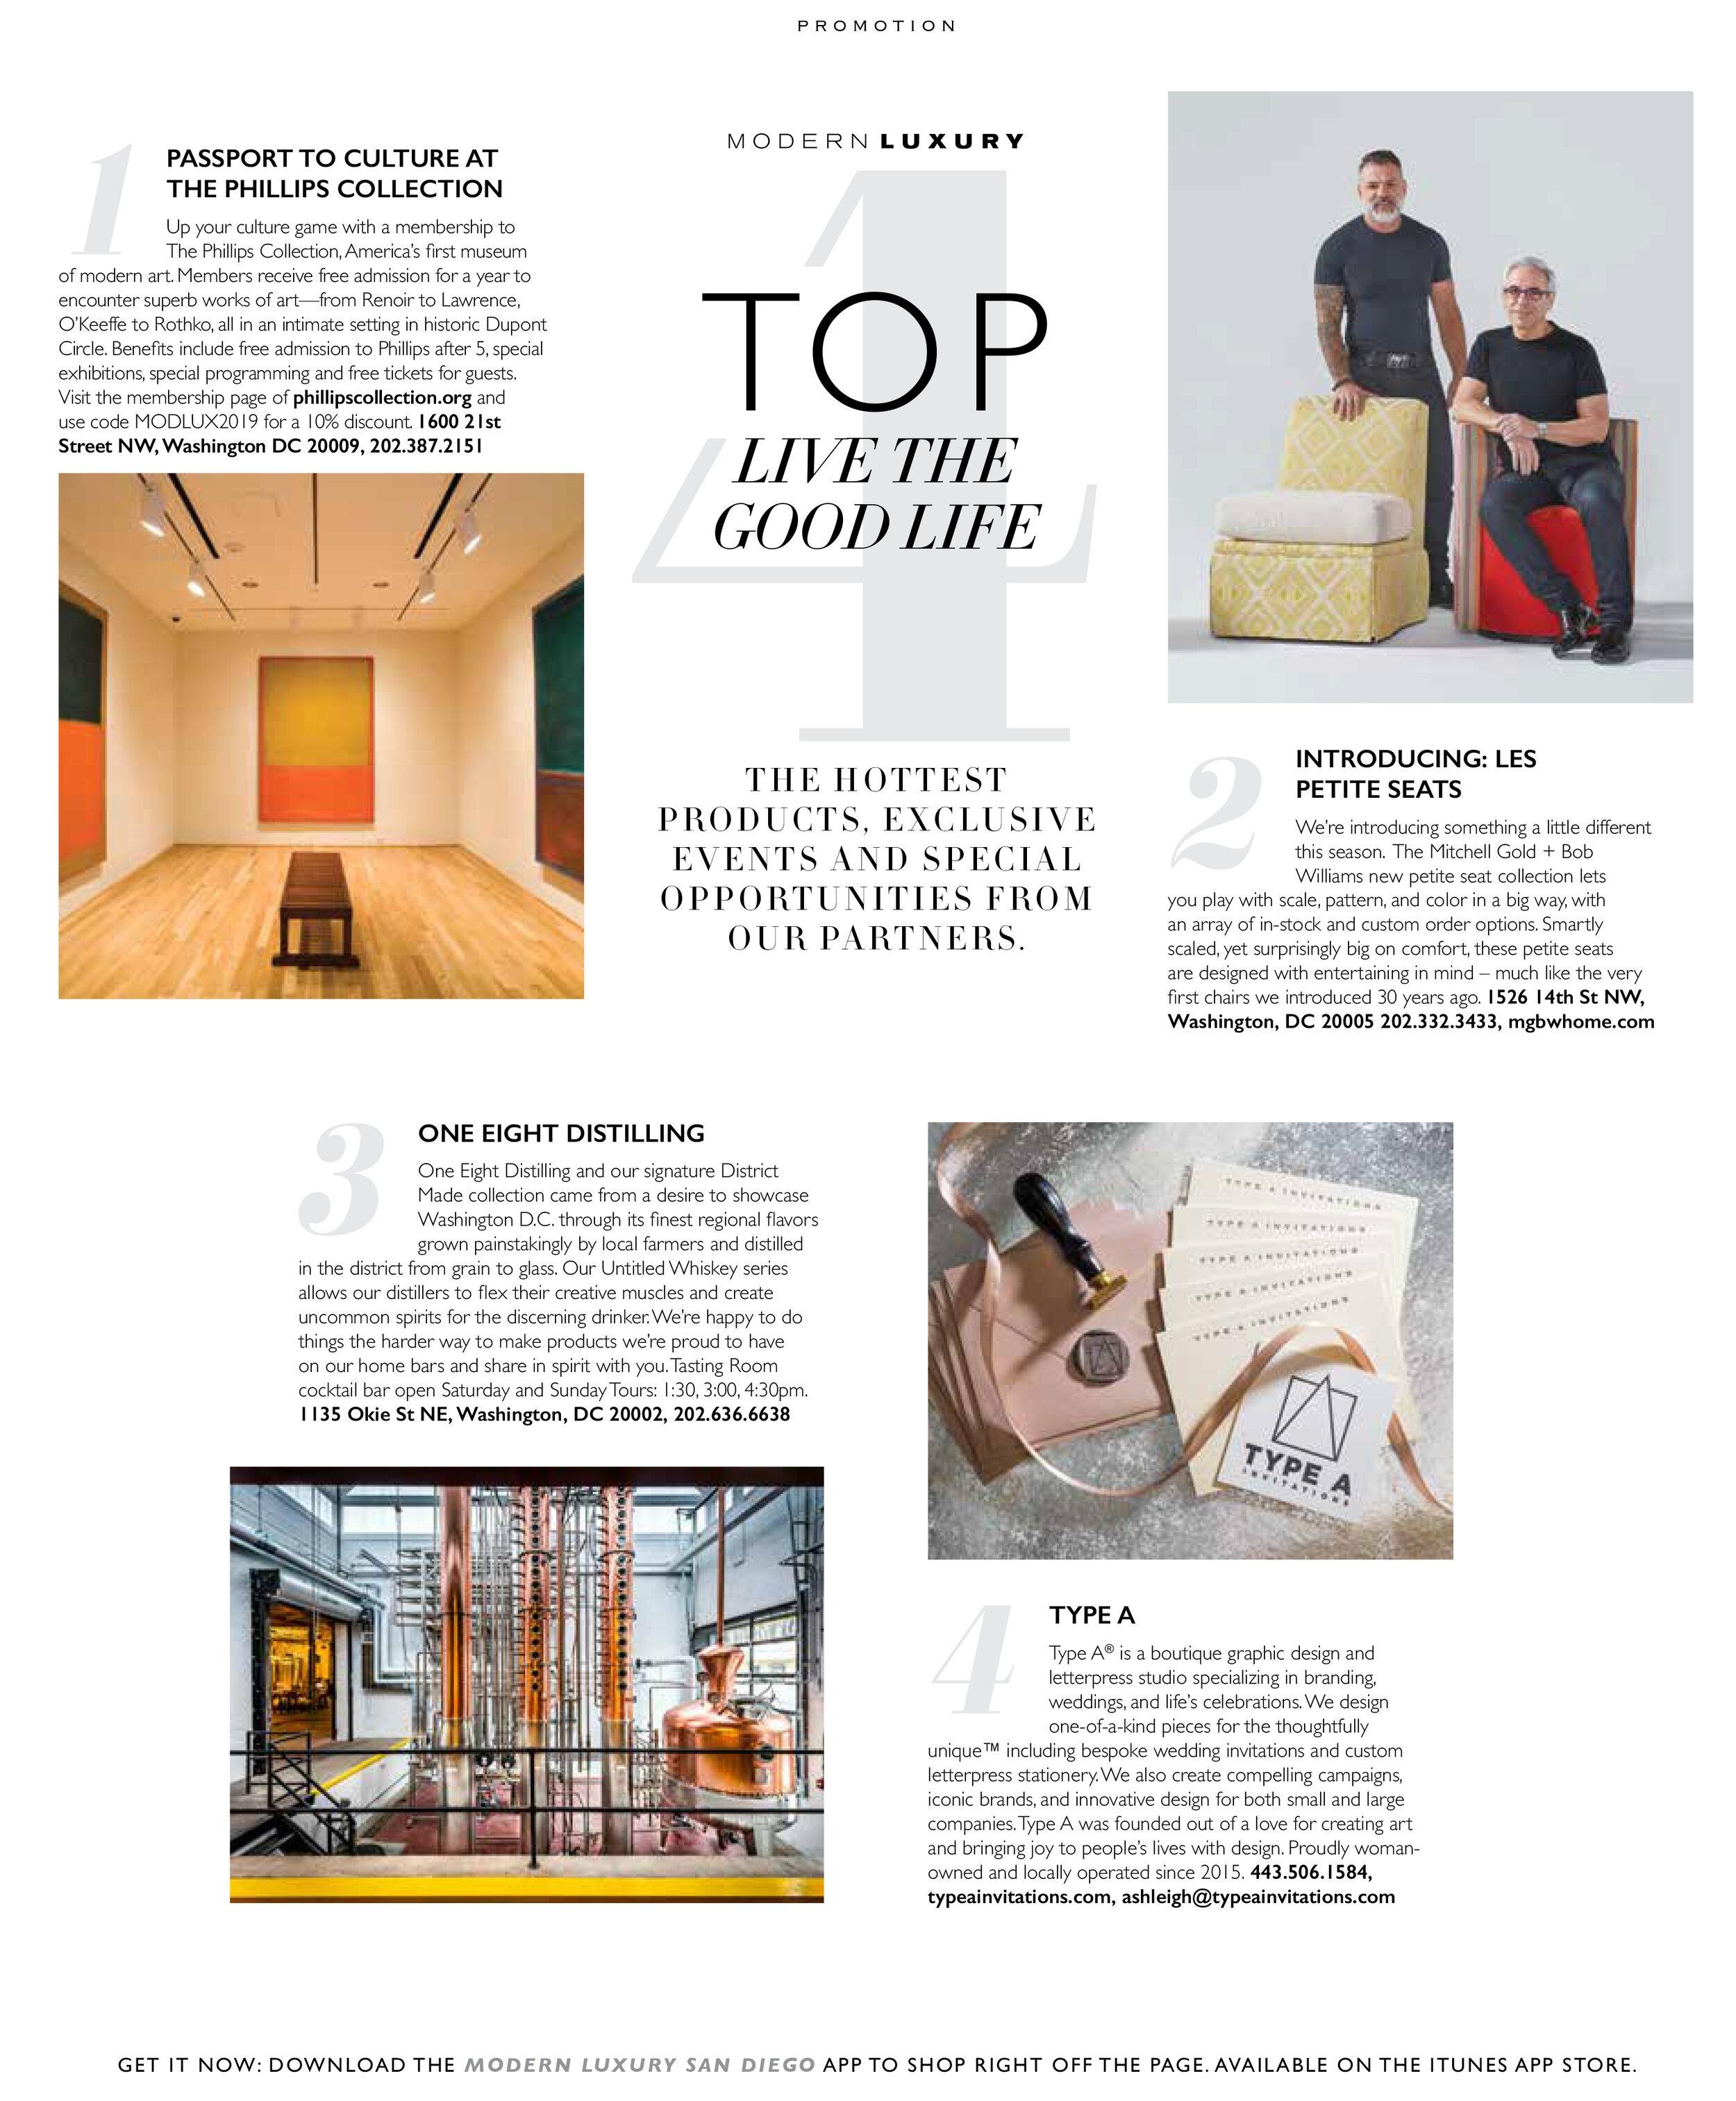 TypeAInvitations_DC-Magazine_ModernLuxury_Letterpress_Invitations_Branding_CustomDesign_38649_TopFour_WASH0419.jpg